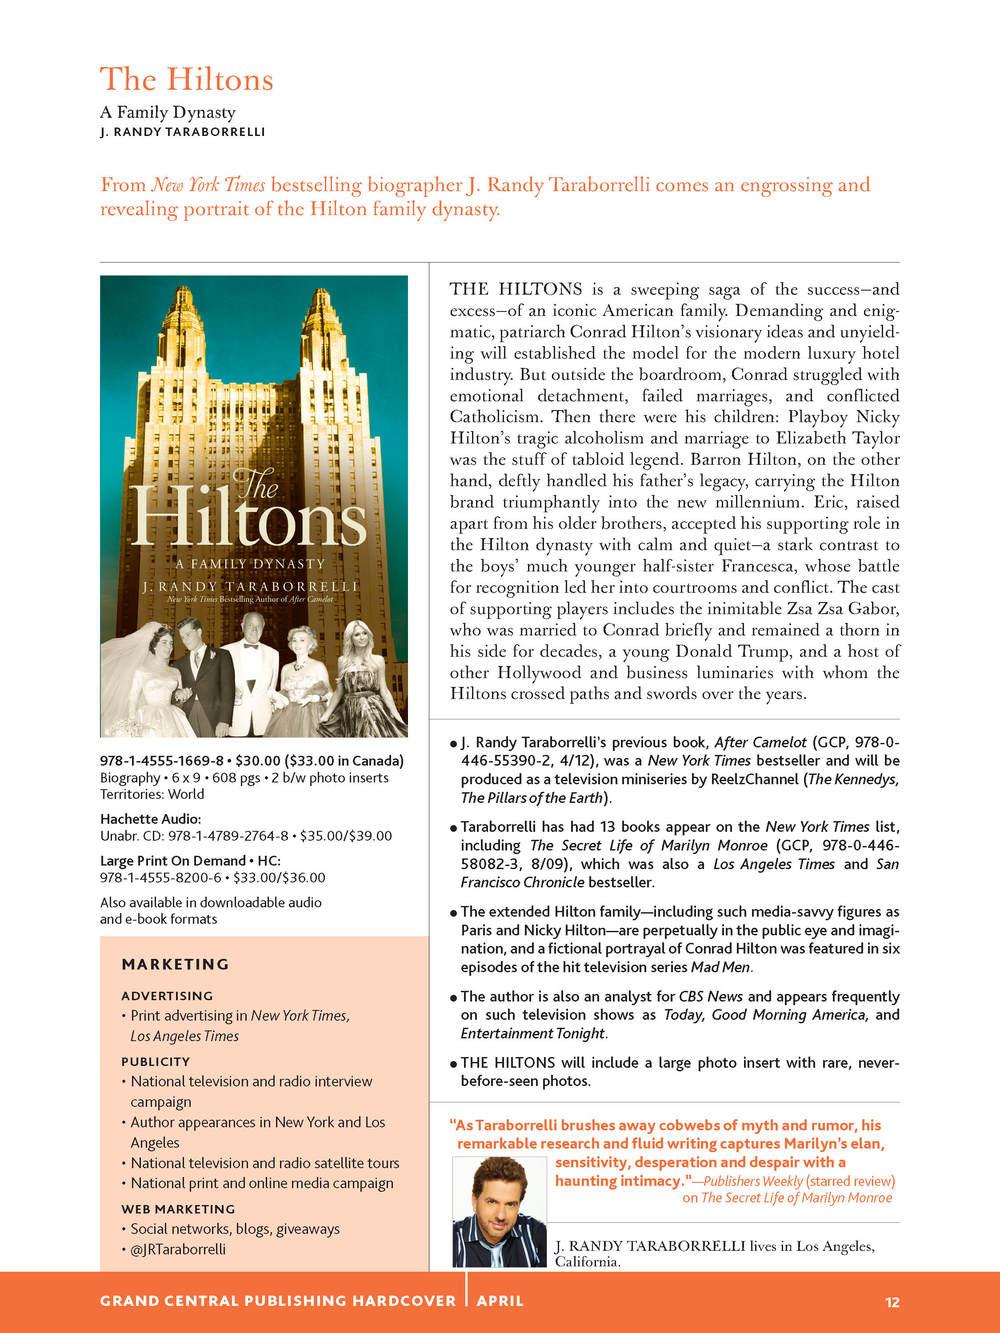 Hiltons catalog page